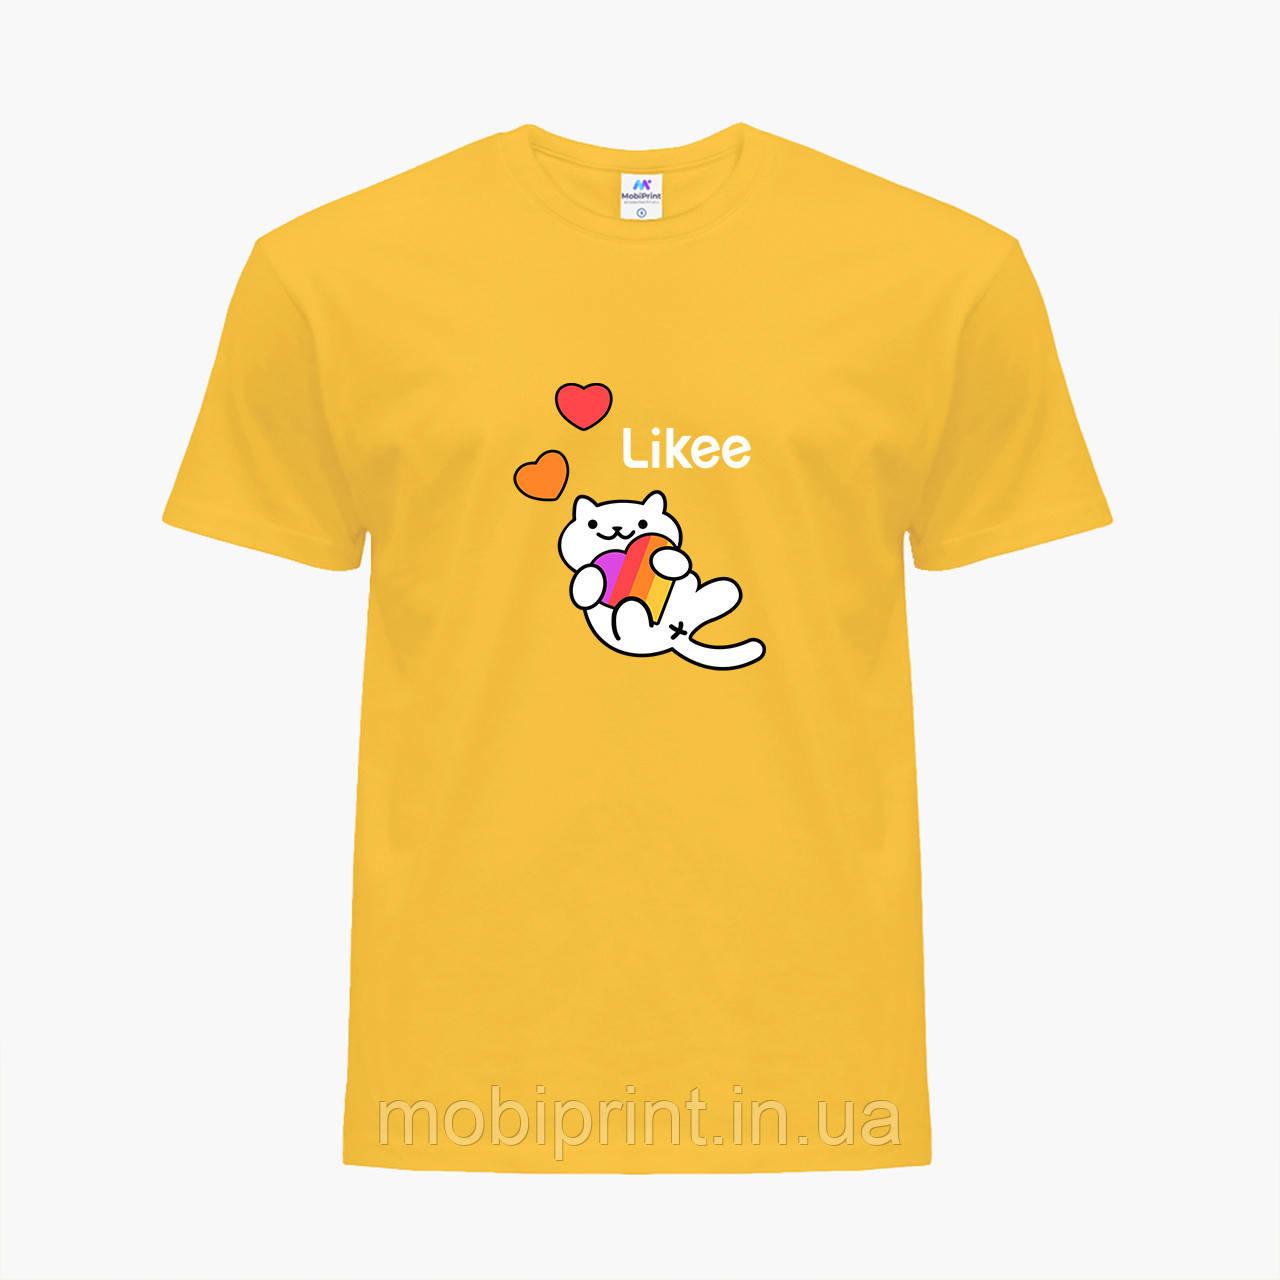 Детская футболка для девочек Лайк (Likee) (25186-1039) Желтый